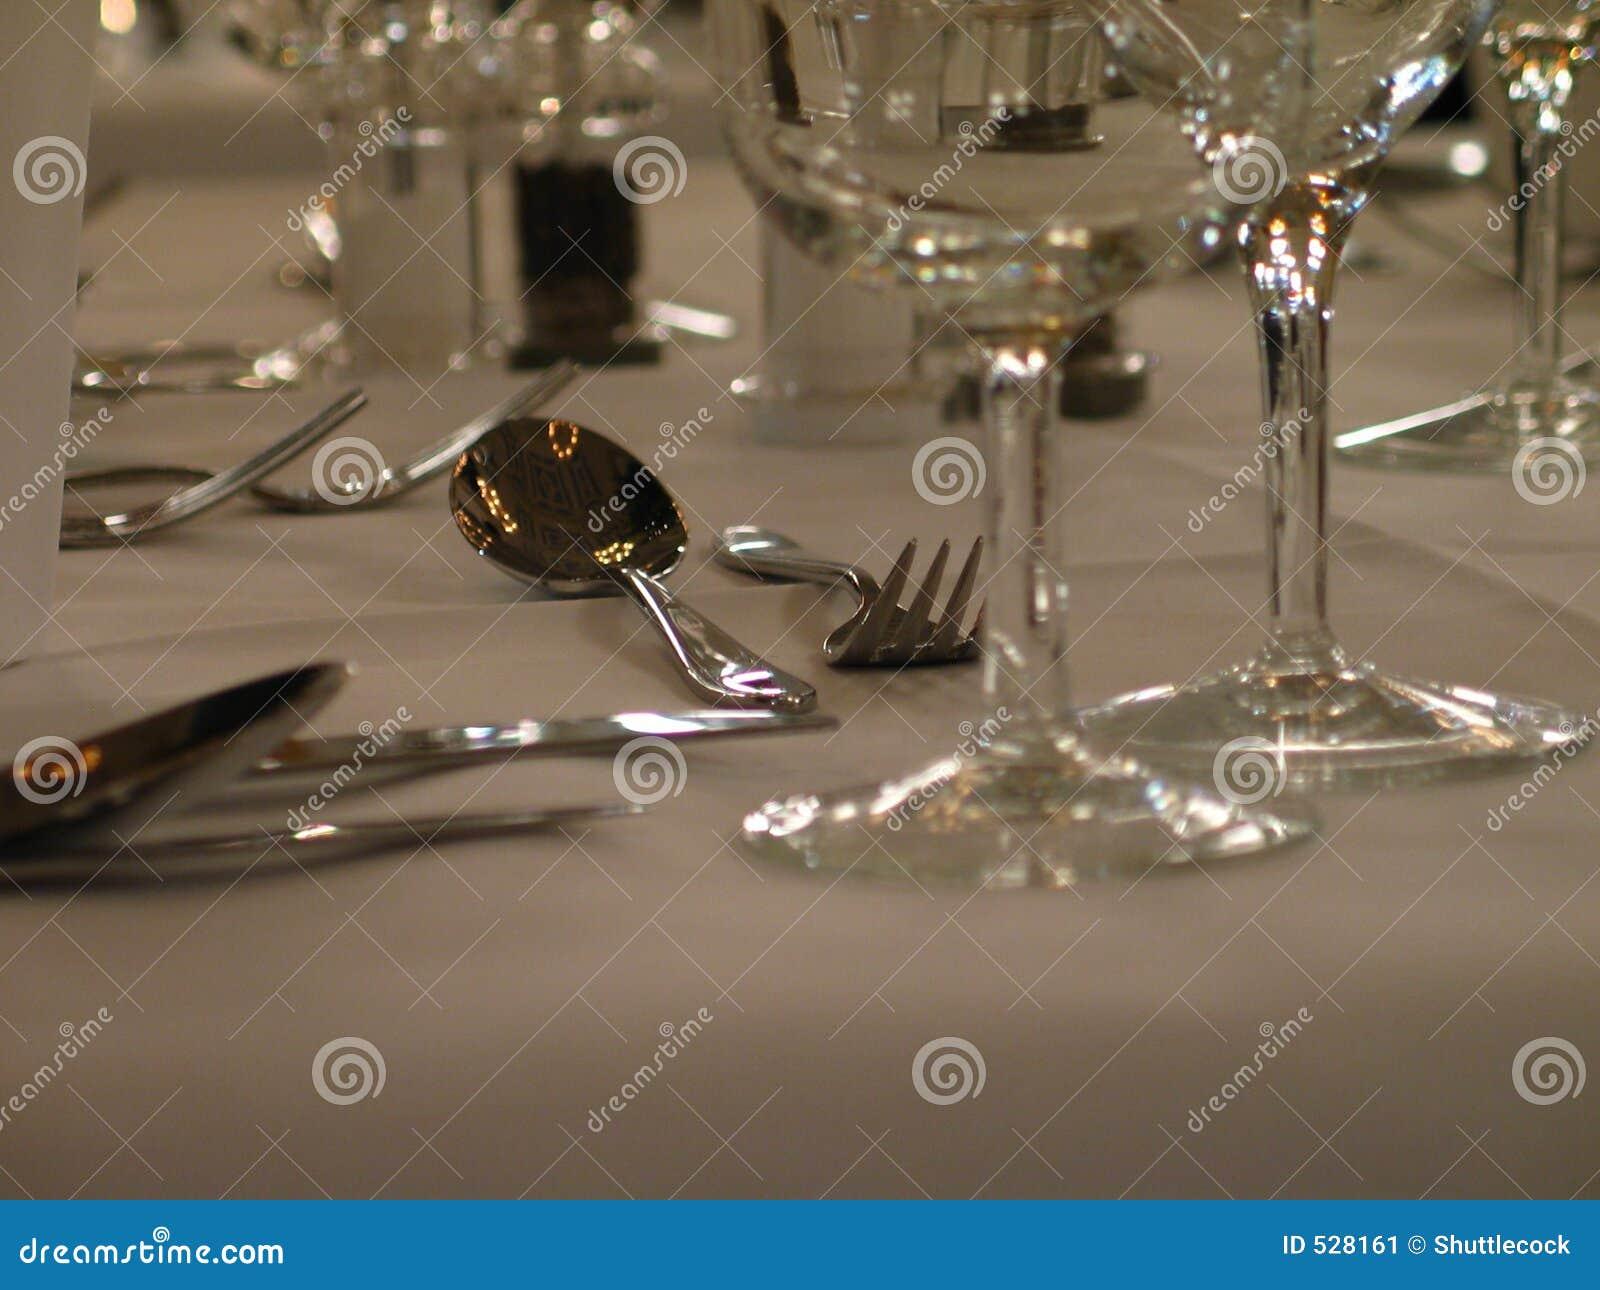 Download 叉子匙子 库存图片. 图片 包括有 玻璃, 正餐, 法国, 用餐, 匙子, 典雅, 正式, 烹调, 叉子 - 528161